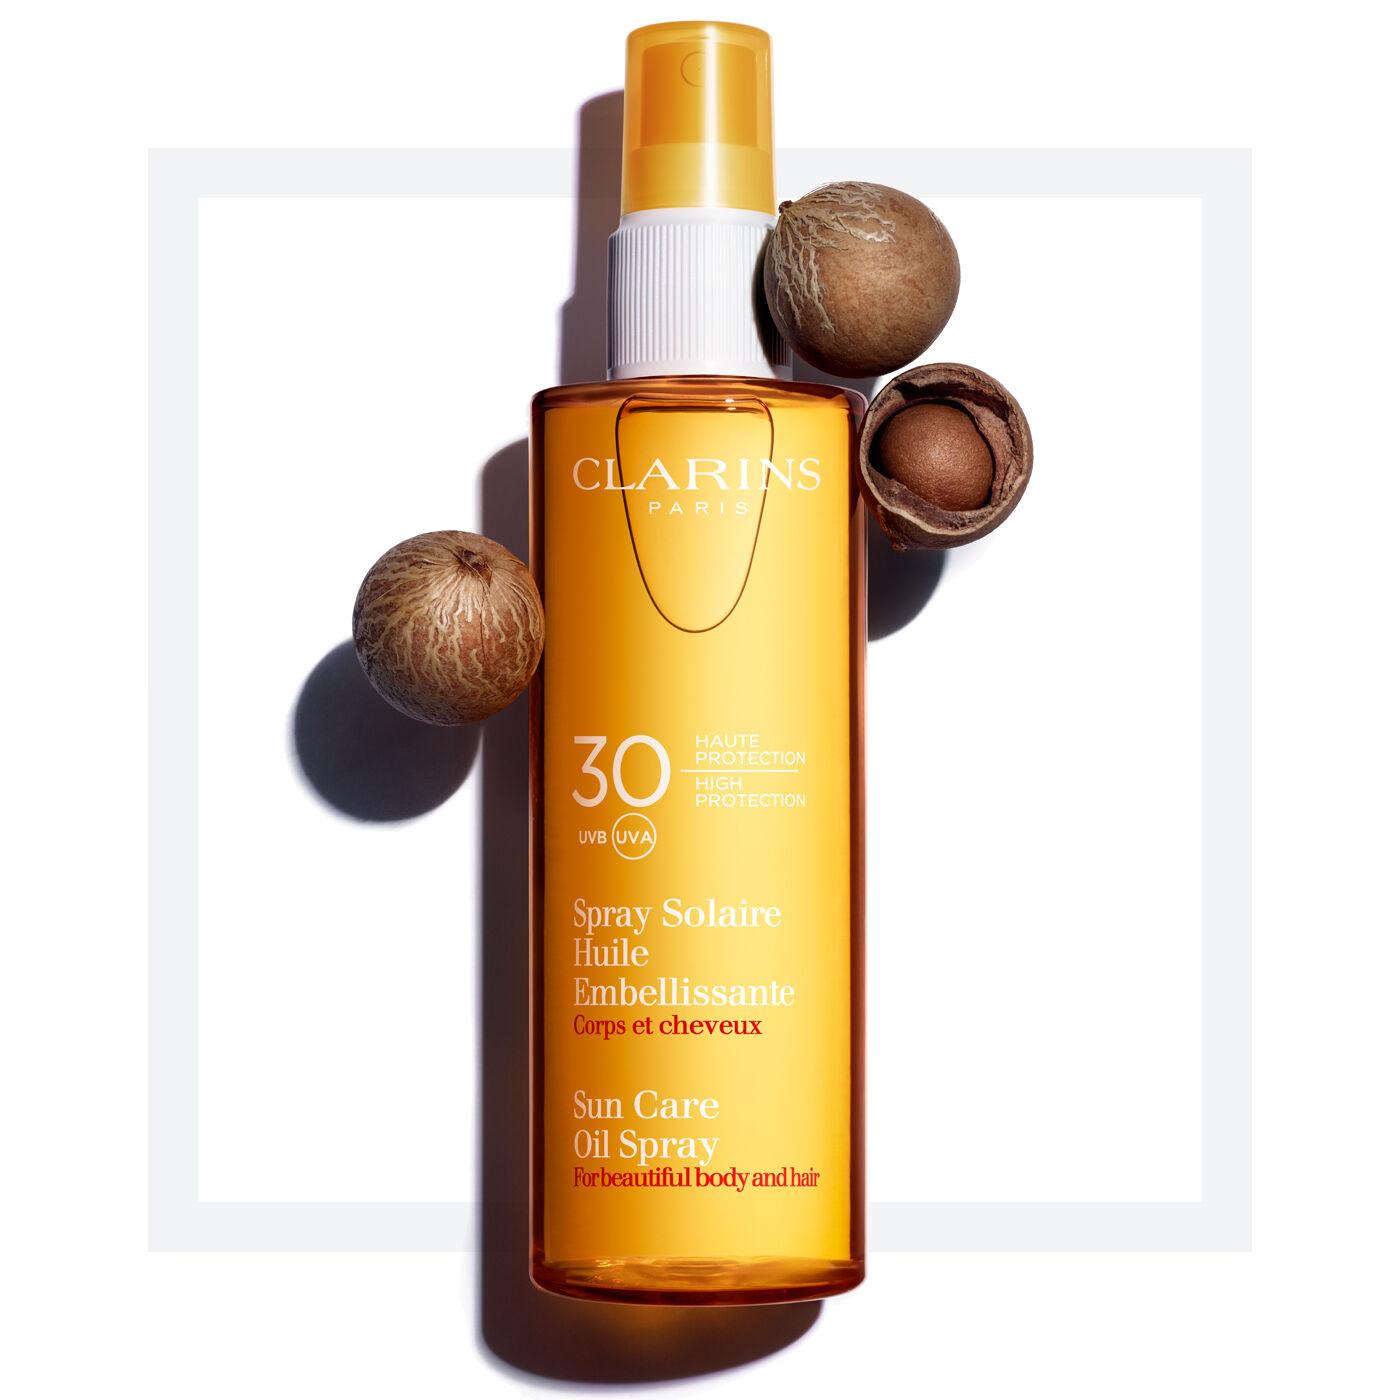 Sun Care Radiant Oil Spray High Protection UVB 30 UVA